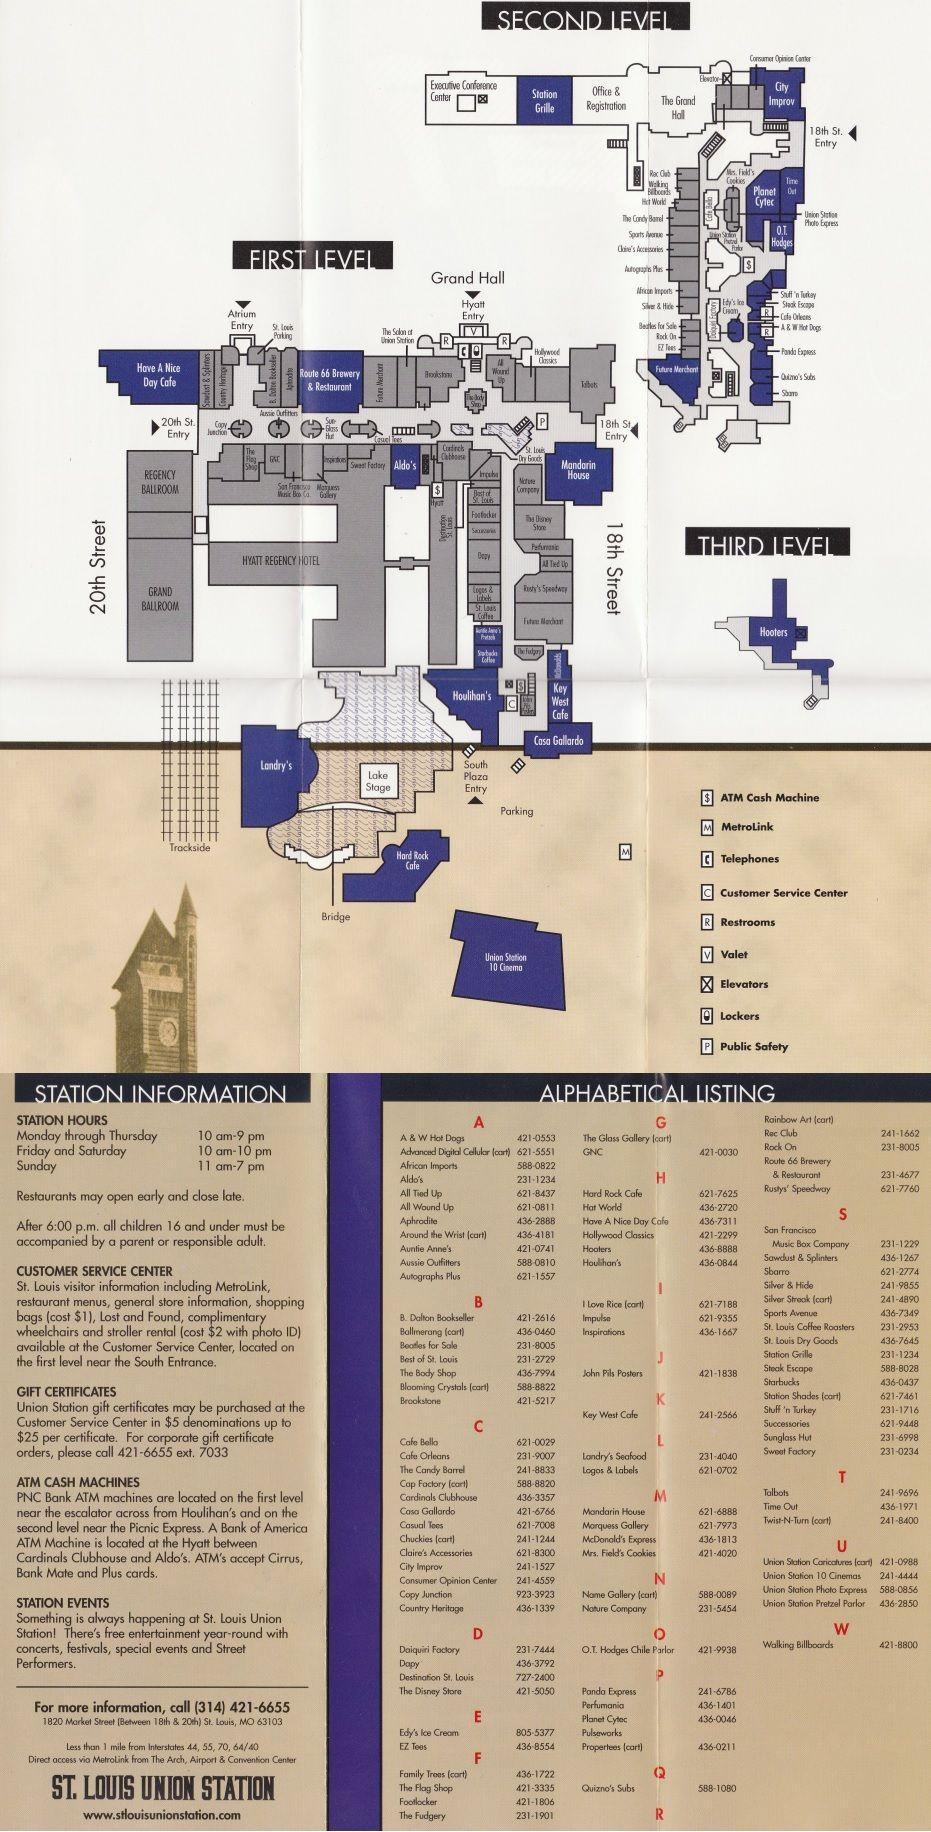 St. Louis Union Station (11 stores